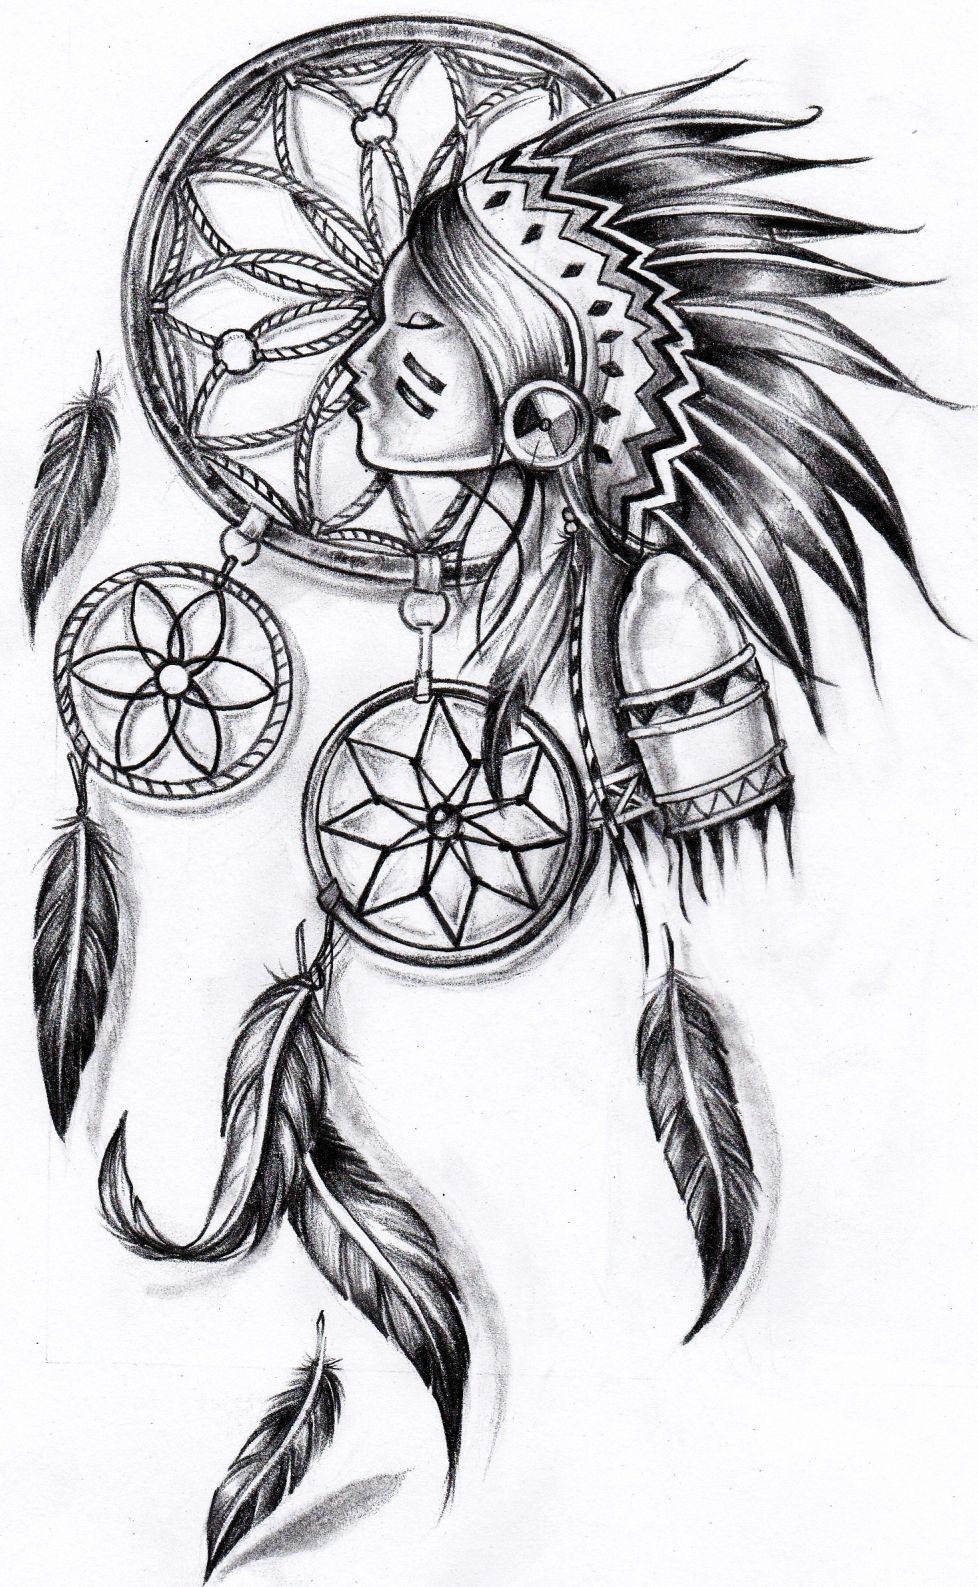 attrape reve dessin - Поиск в Google | Drawing | Pinterest | Attrape ...